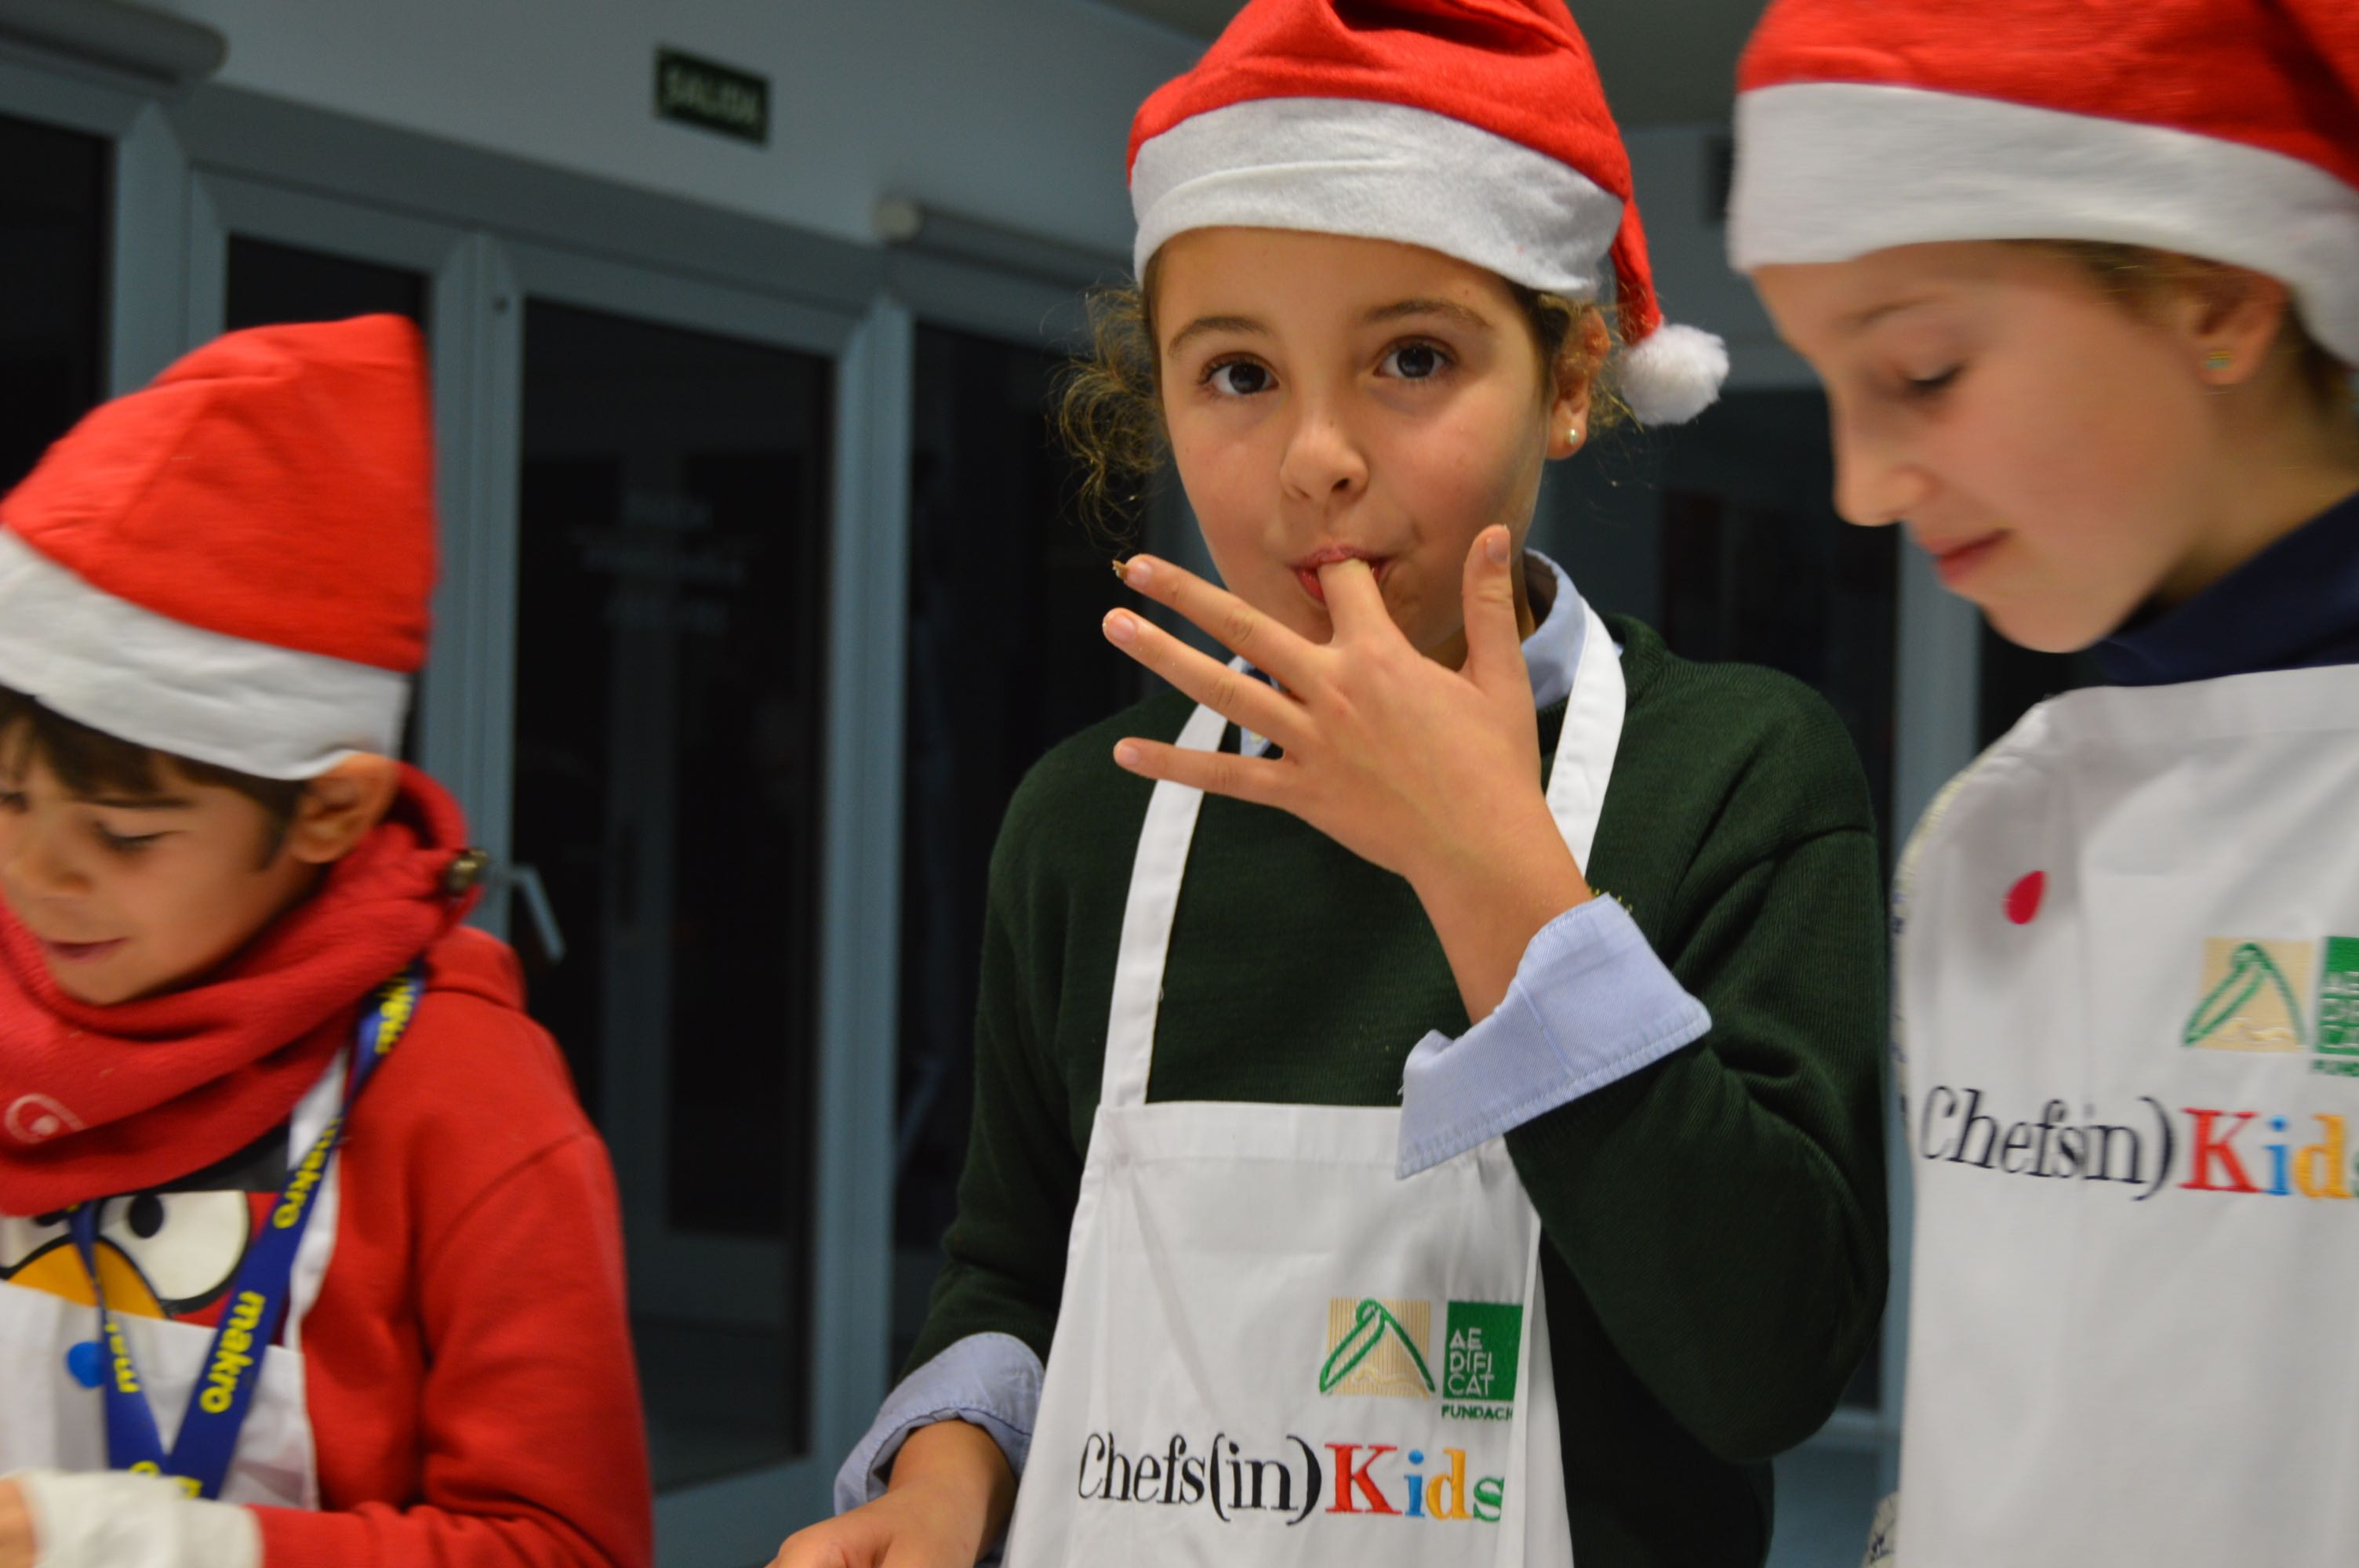 Chefs(in)Kids!